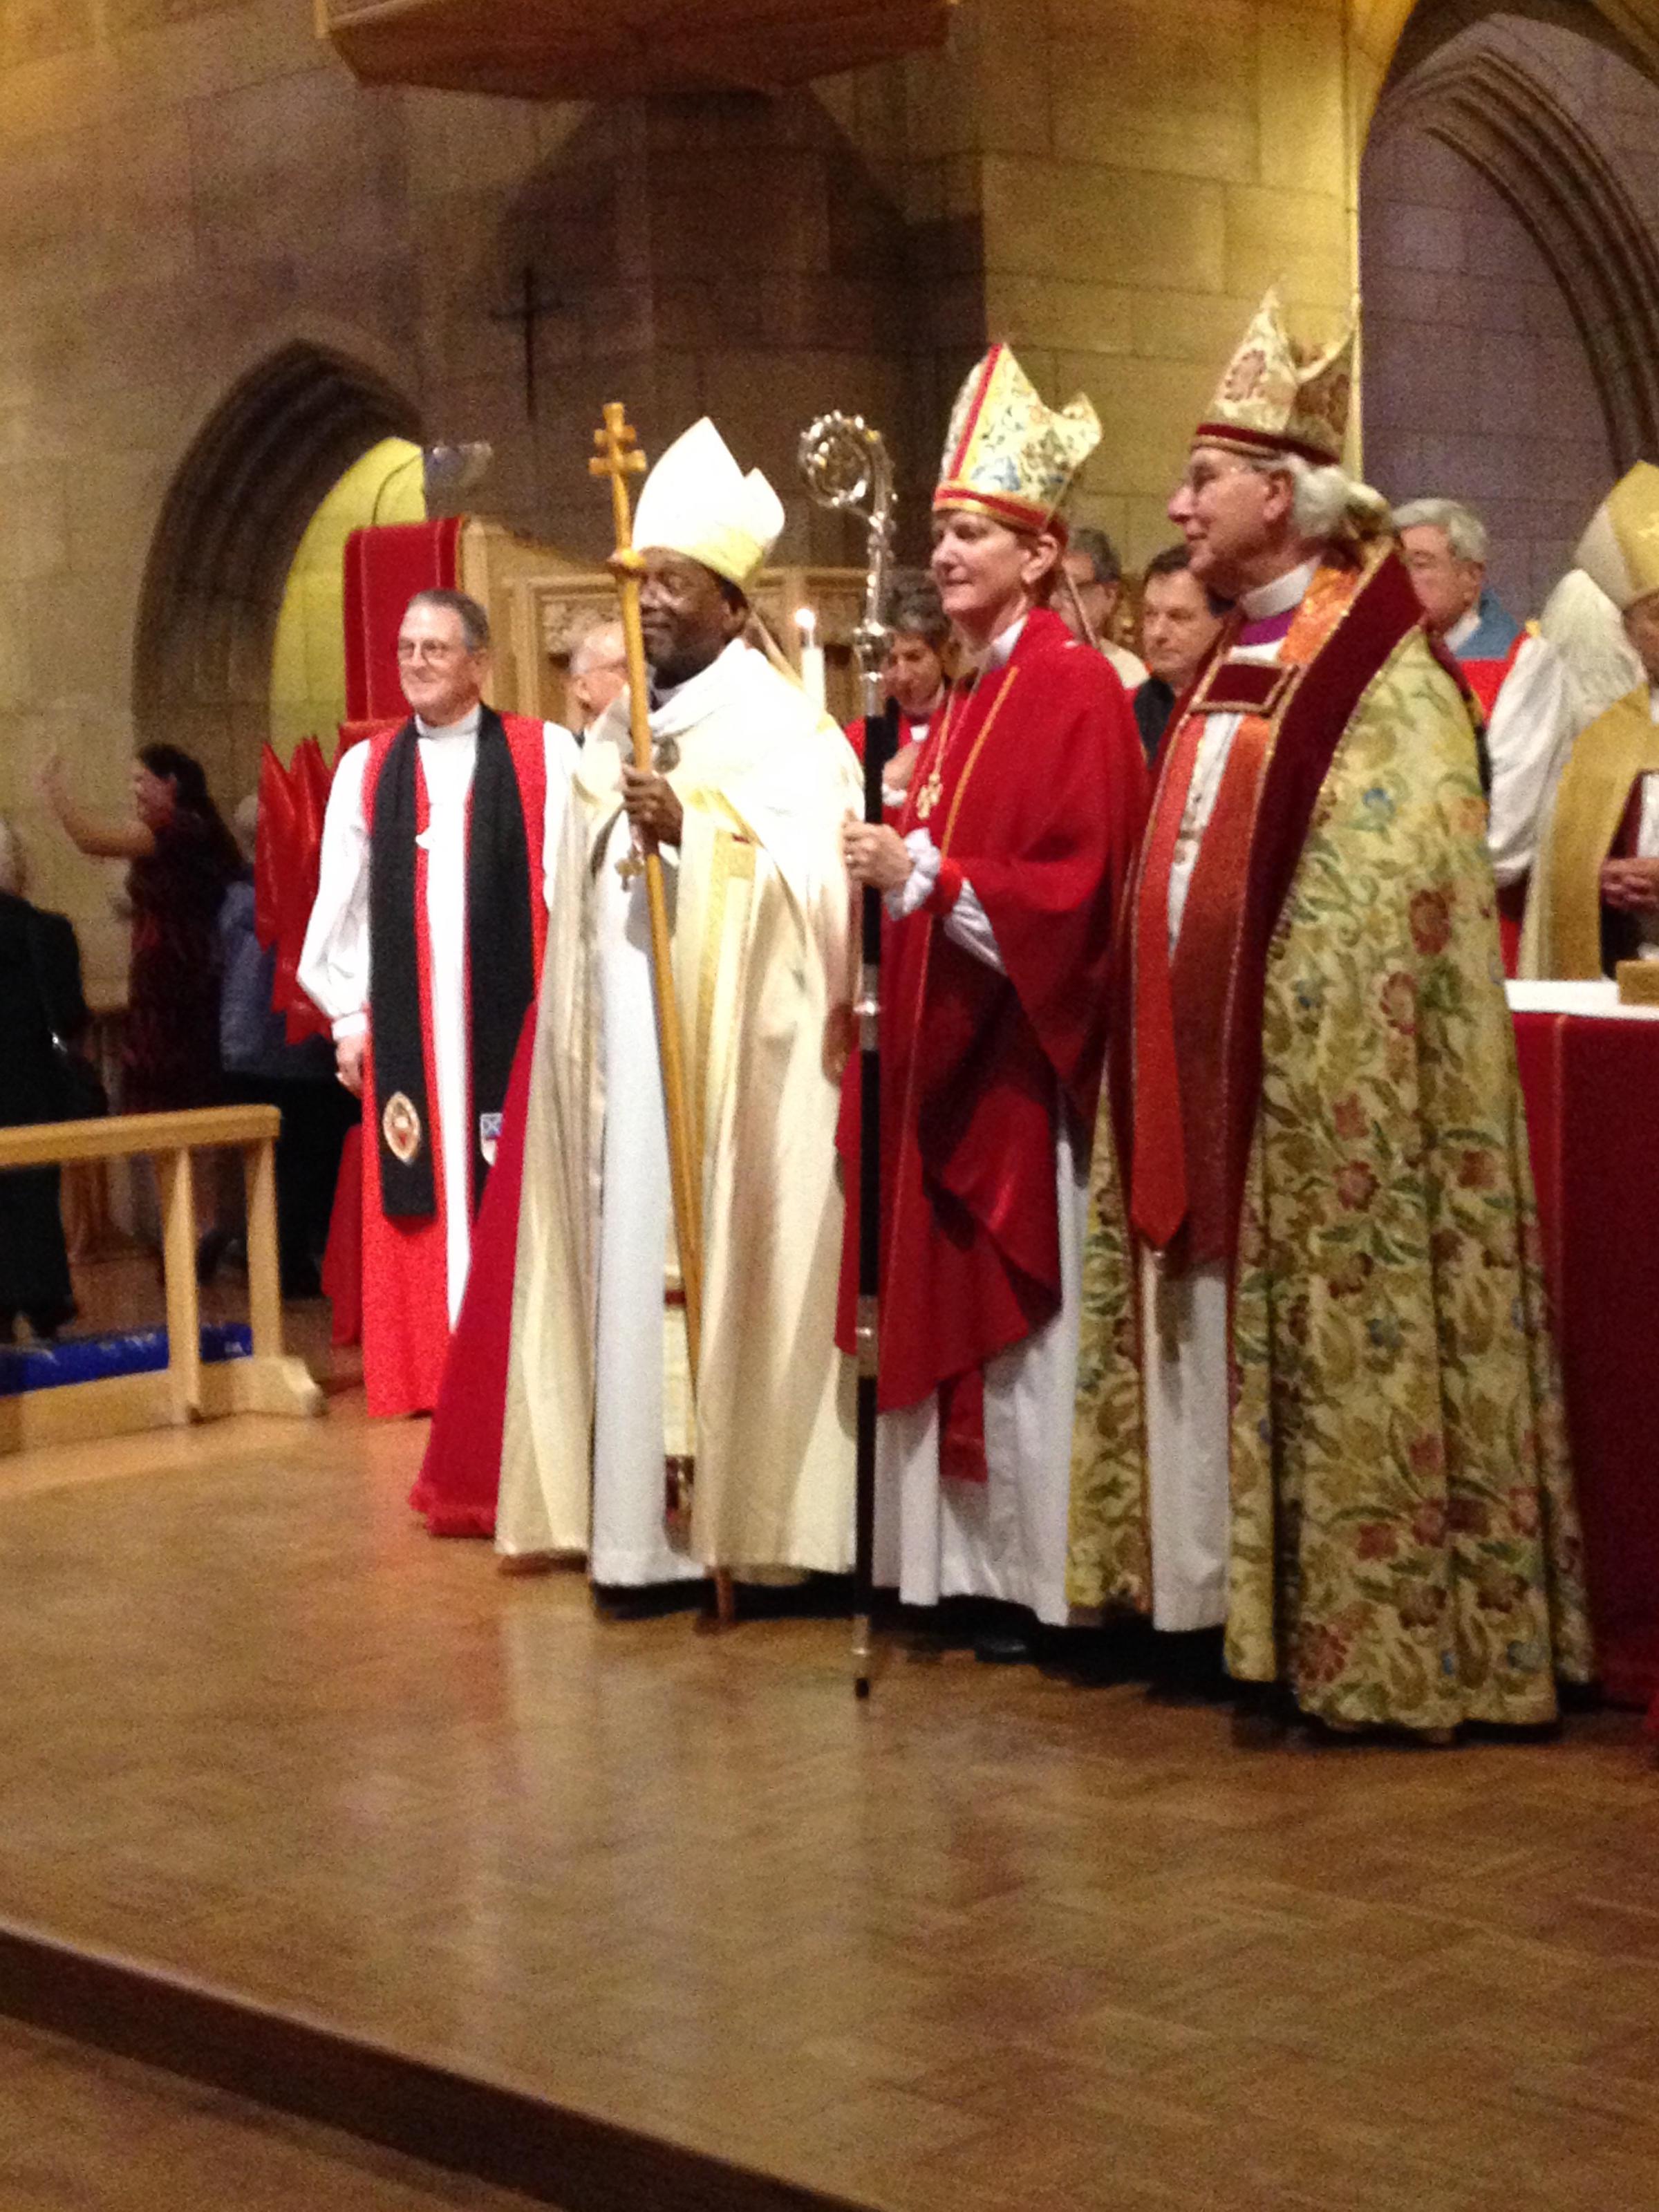 episcopal church and gay bishops